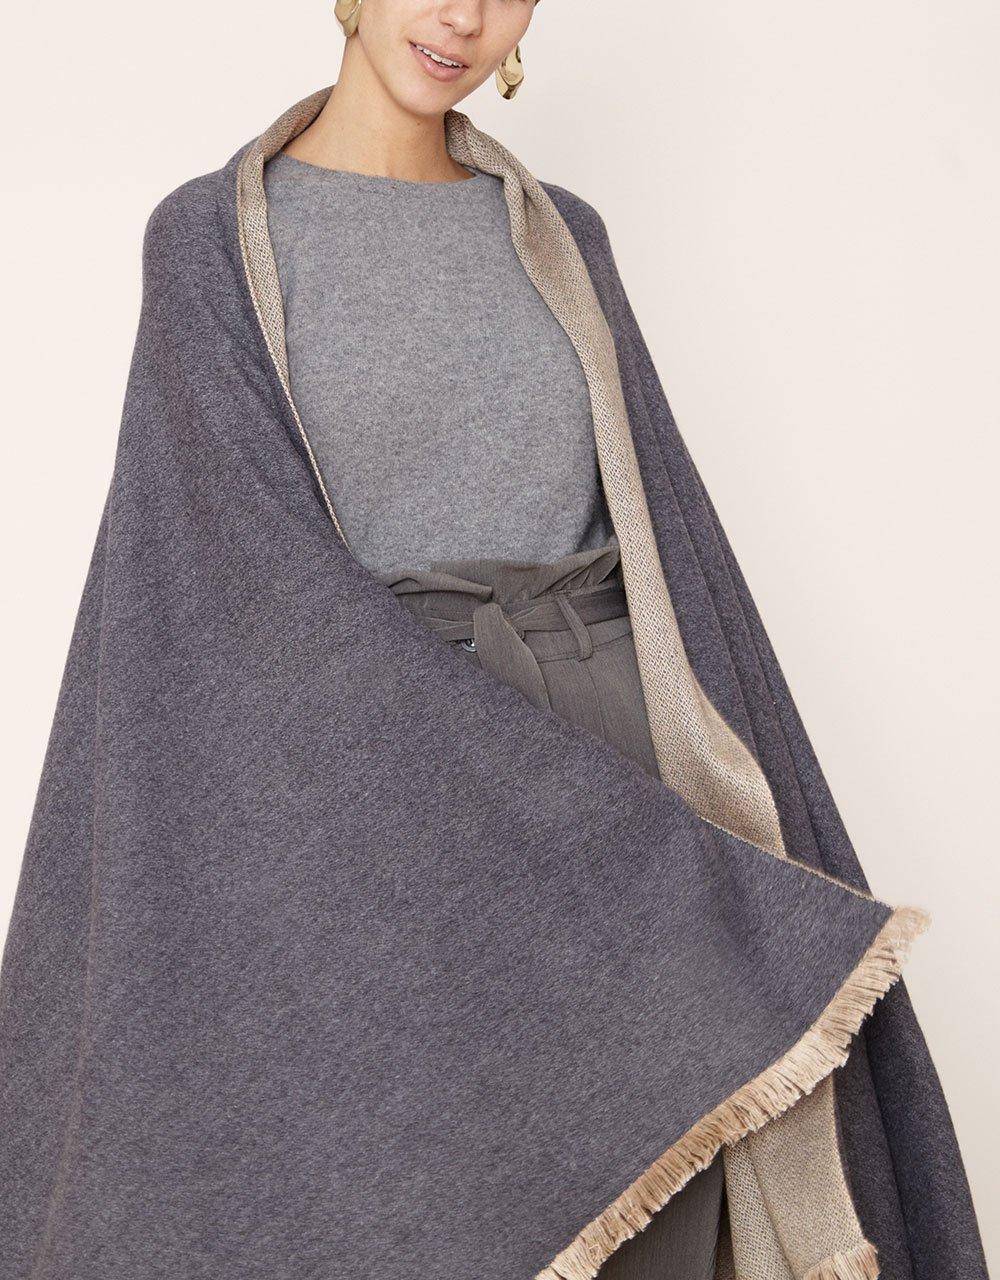 blanket03f